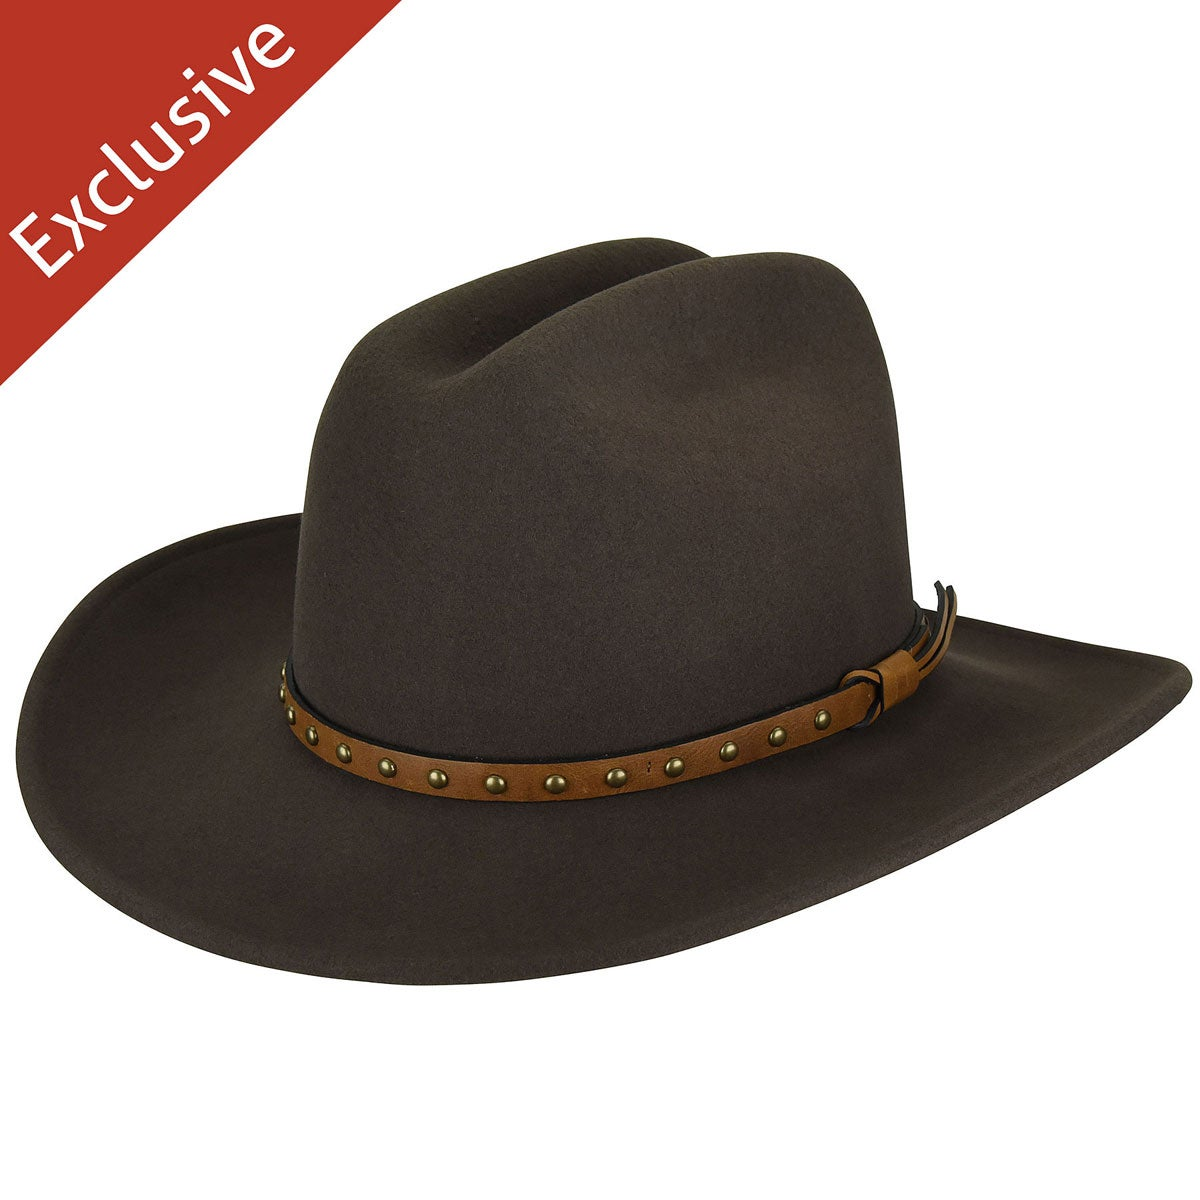 Hats.com Certitude Western Hat - Exclusive in Olive